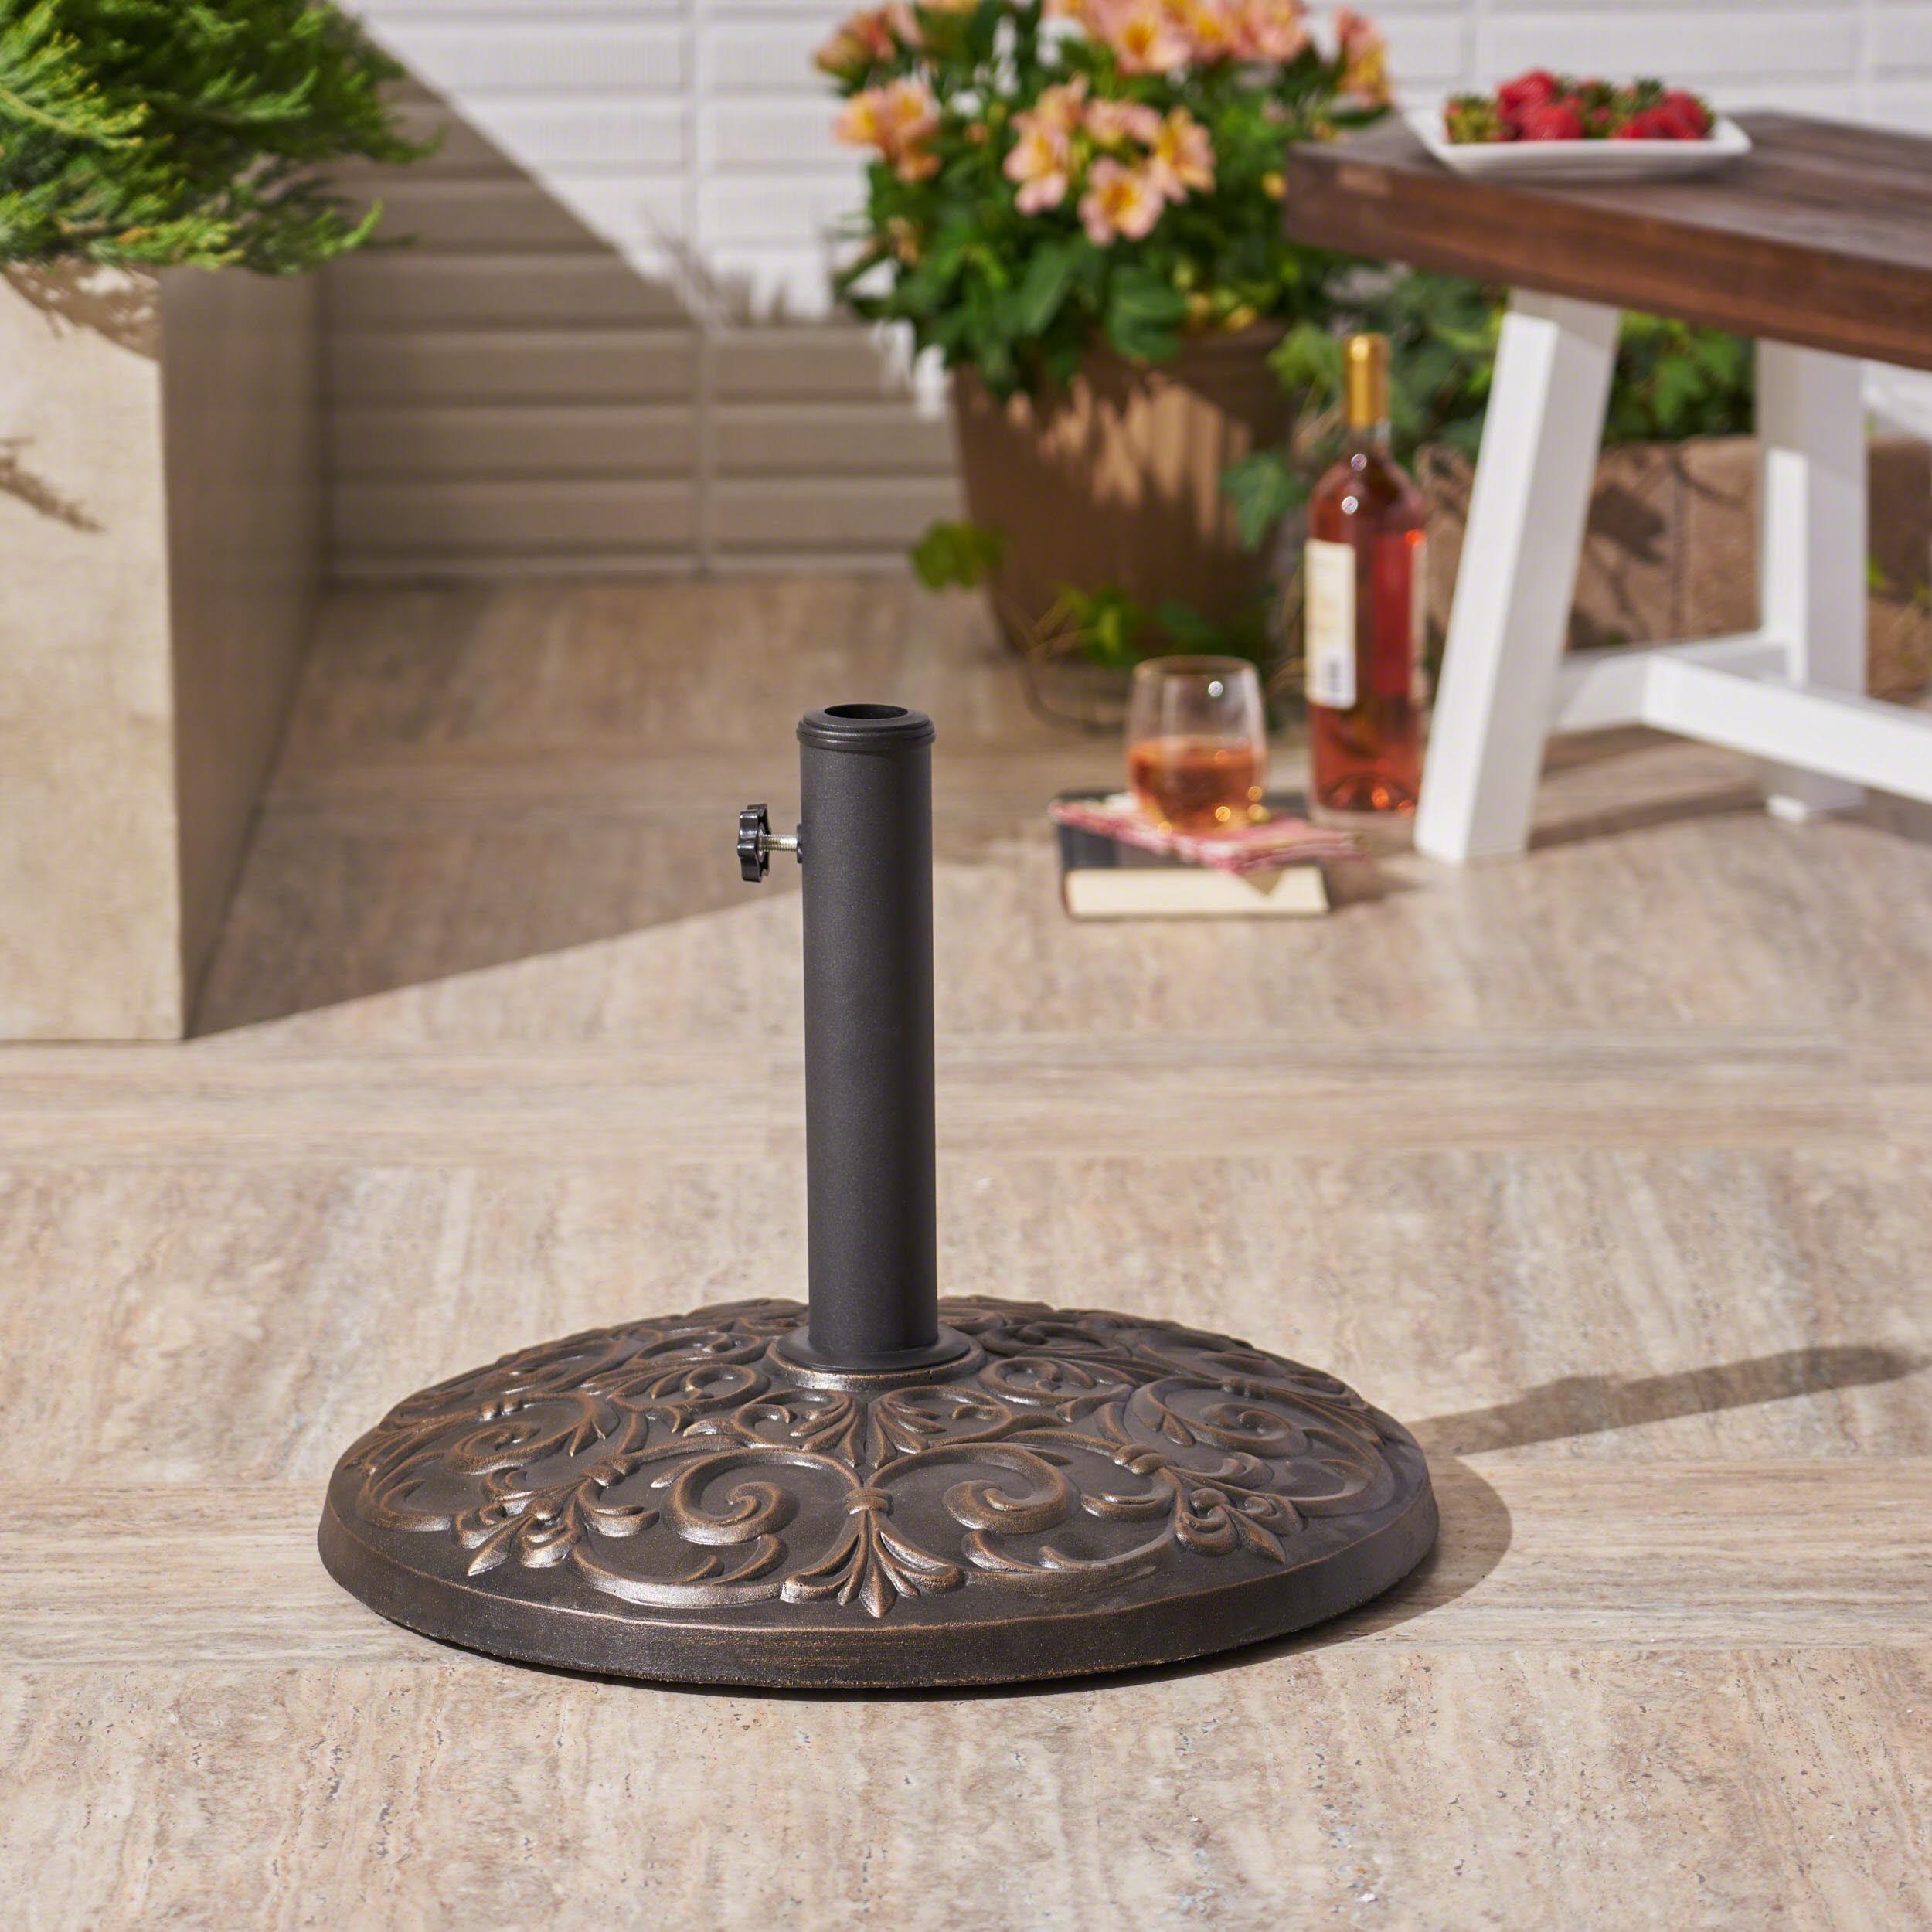 Rosado Outdoor 60lb Concrete Circular Umbrella Base, Hammered Dark Copper